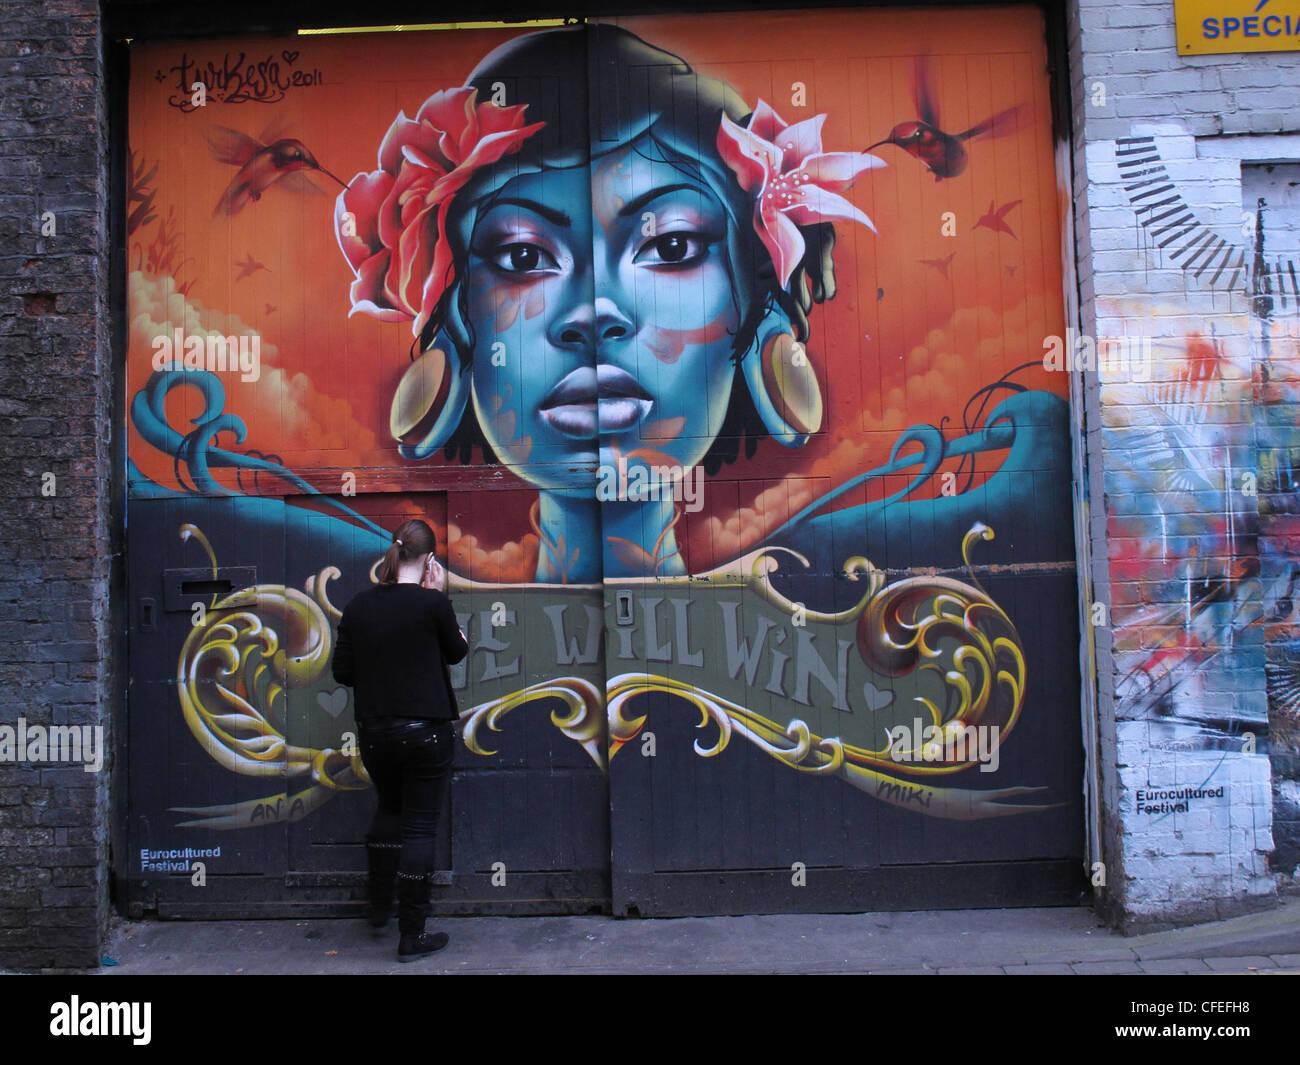 Inner,City,Manchester,Graffiti,New,wakefield,street,under,railway,arches,gotonysmith,girl,lady,drawing,femail,door,walking,in,female,woman,entry,entrance,GB,UK,Great,Britain,British,graffitti,grafitti